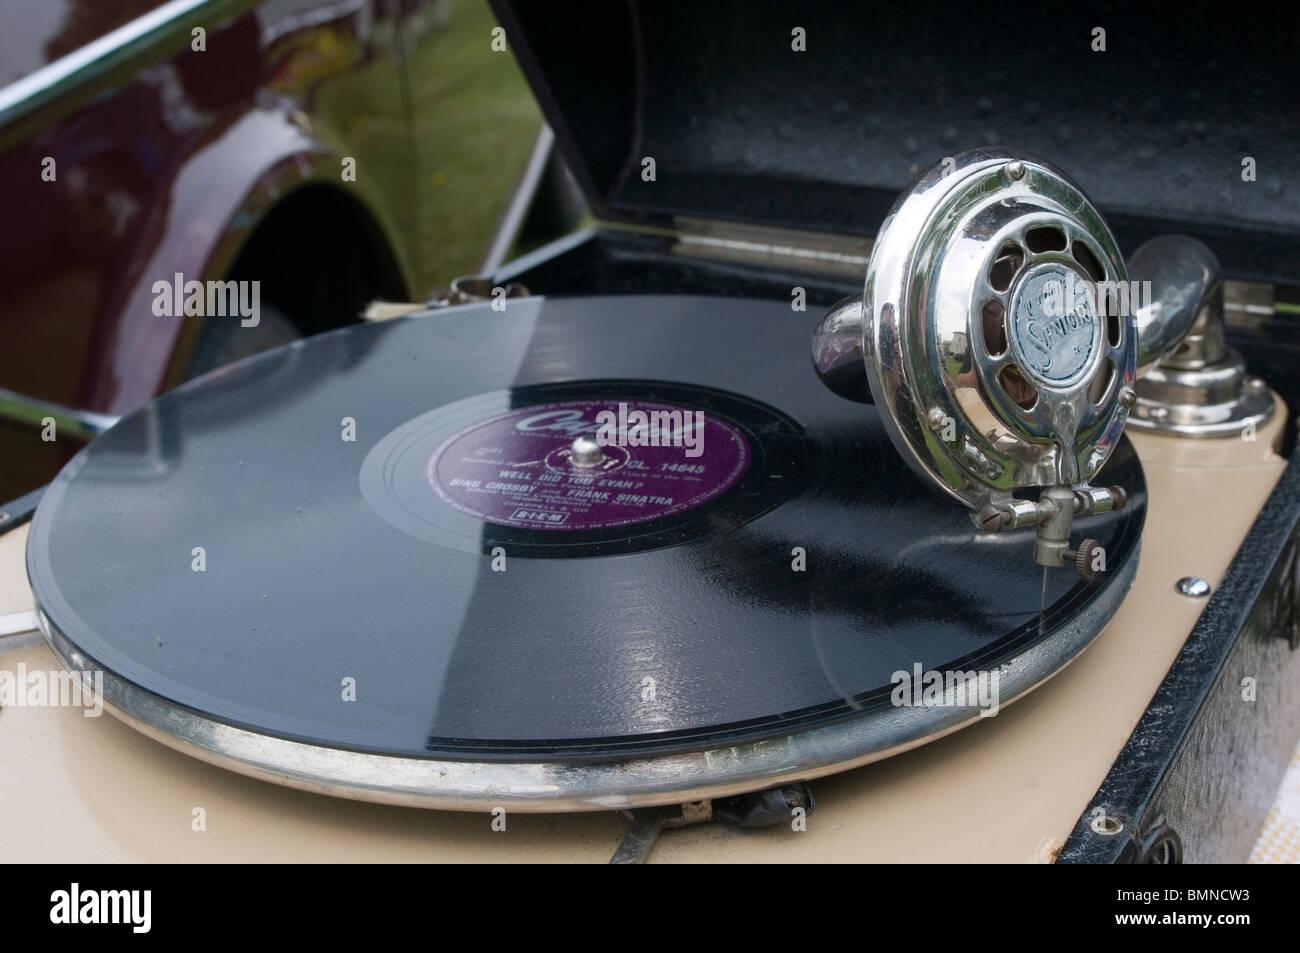 old record player records players long playing fashioned stereo mono needle vinyl deck decks disk jockey jockeys - Stock Image